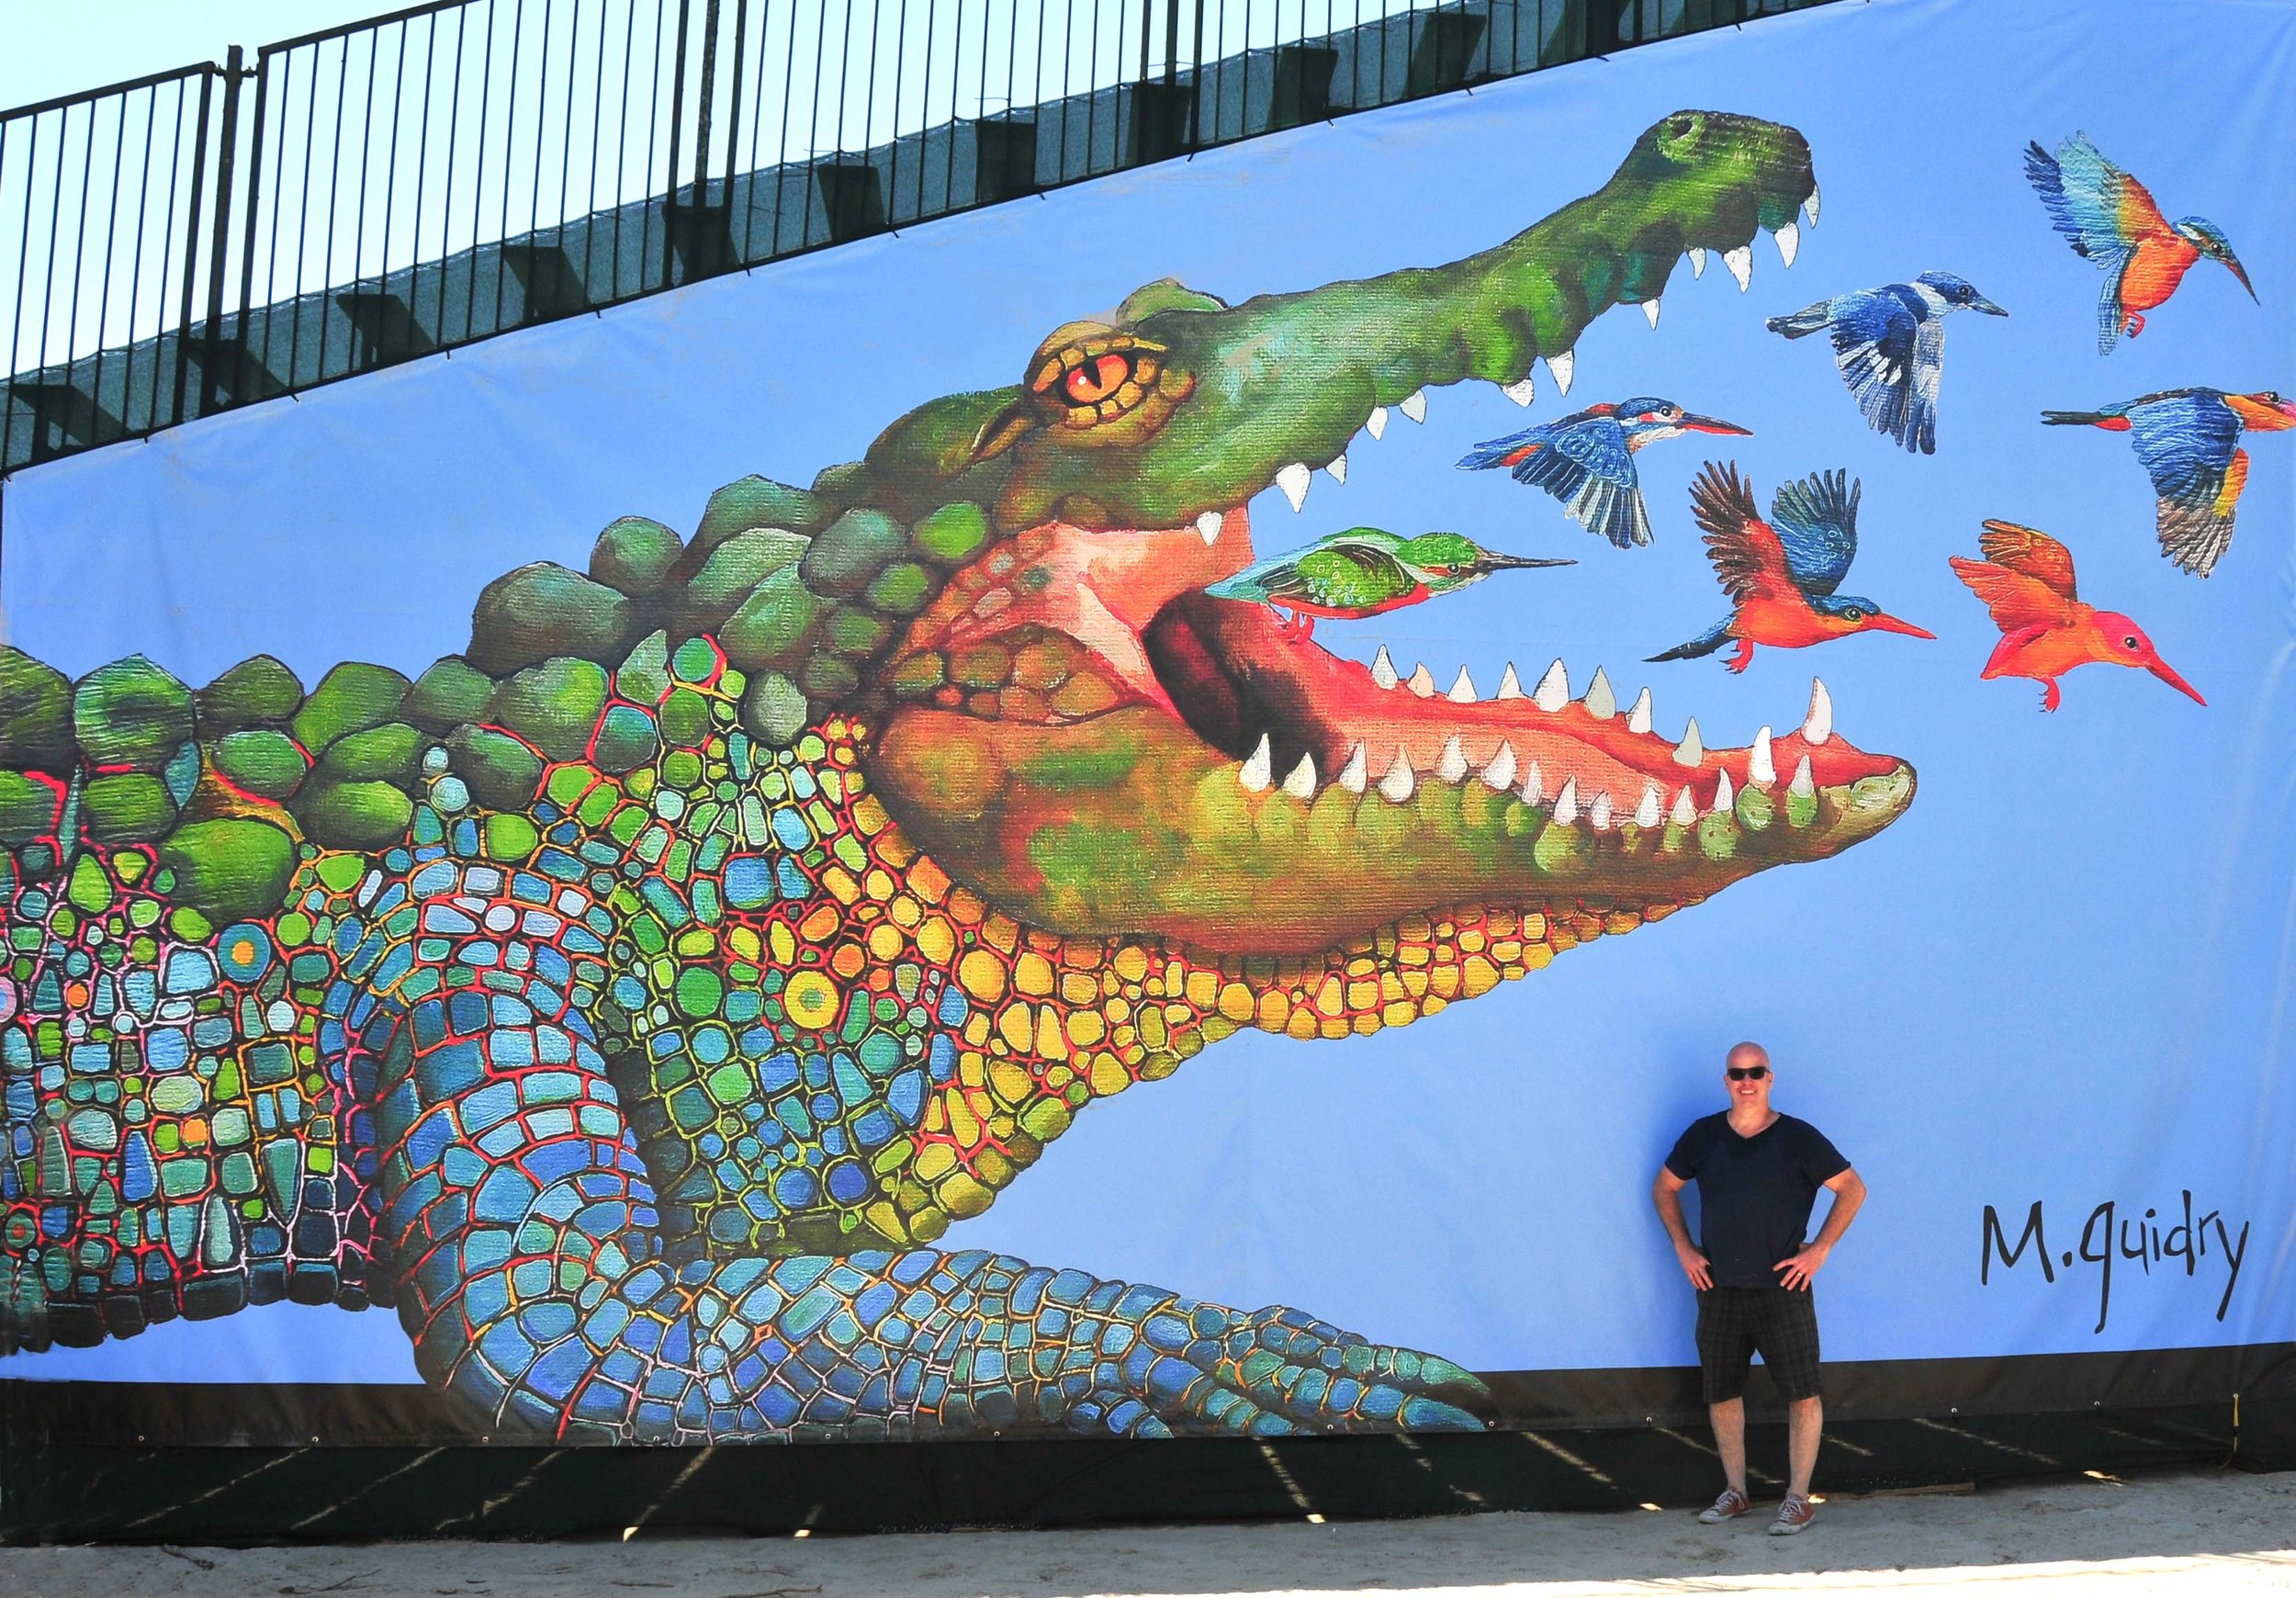 m-guidry-michael-new-orleans-louisiana-artist-alligator-jazzfest-jazz-fest-jazz-and-heritage-festival-art-artist-painting-alligatort-birds-bleacher.jpg